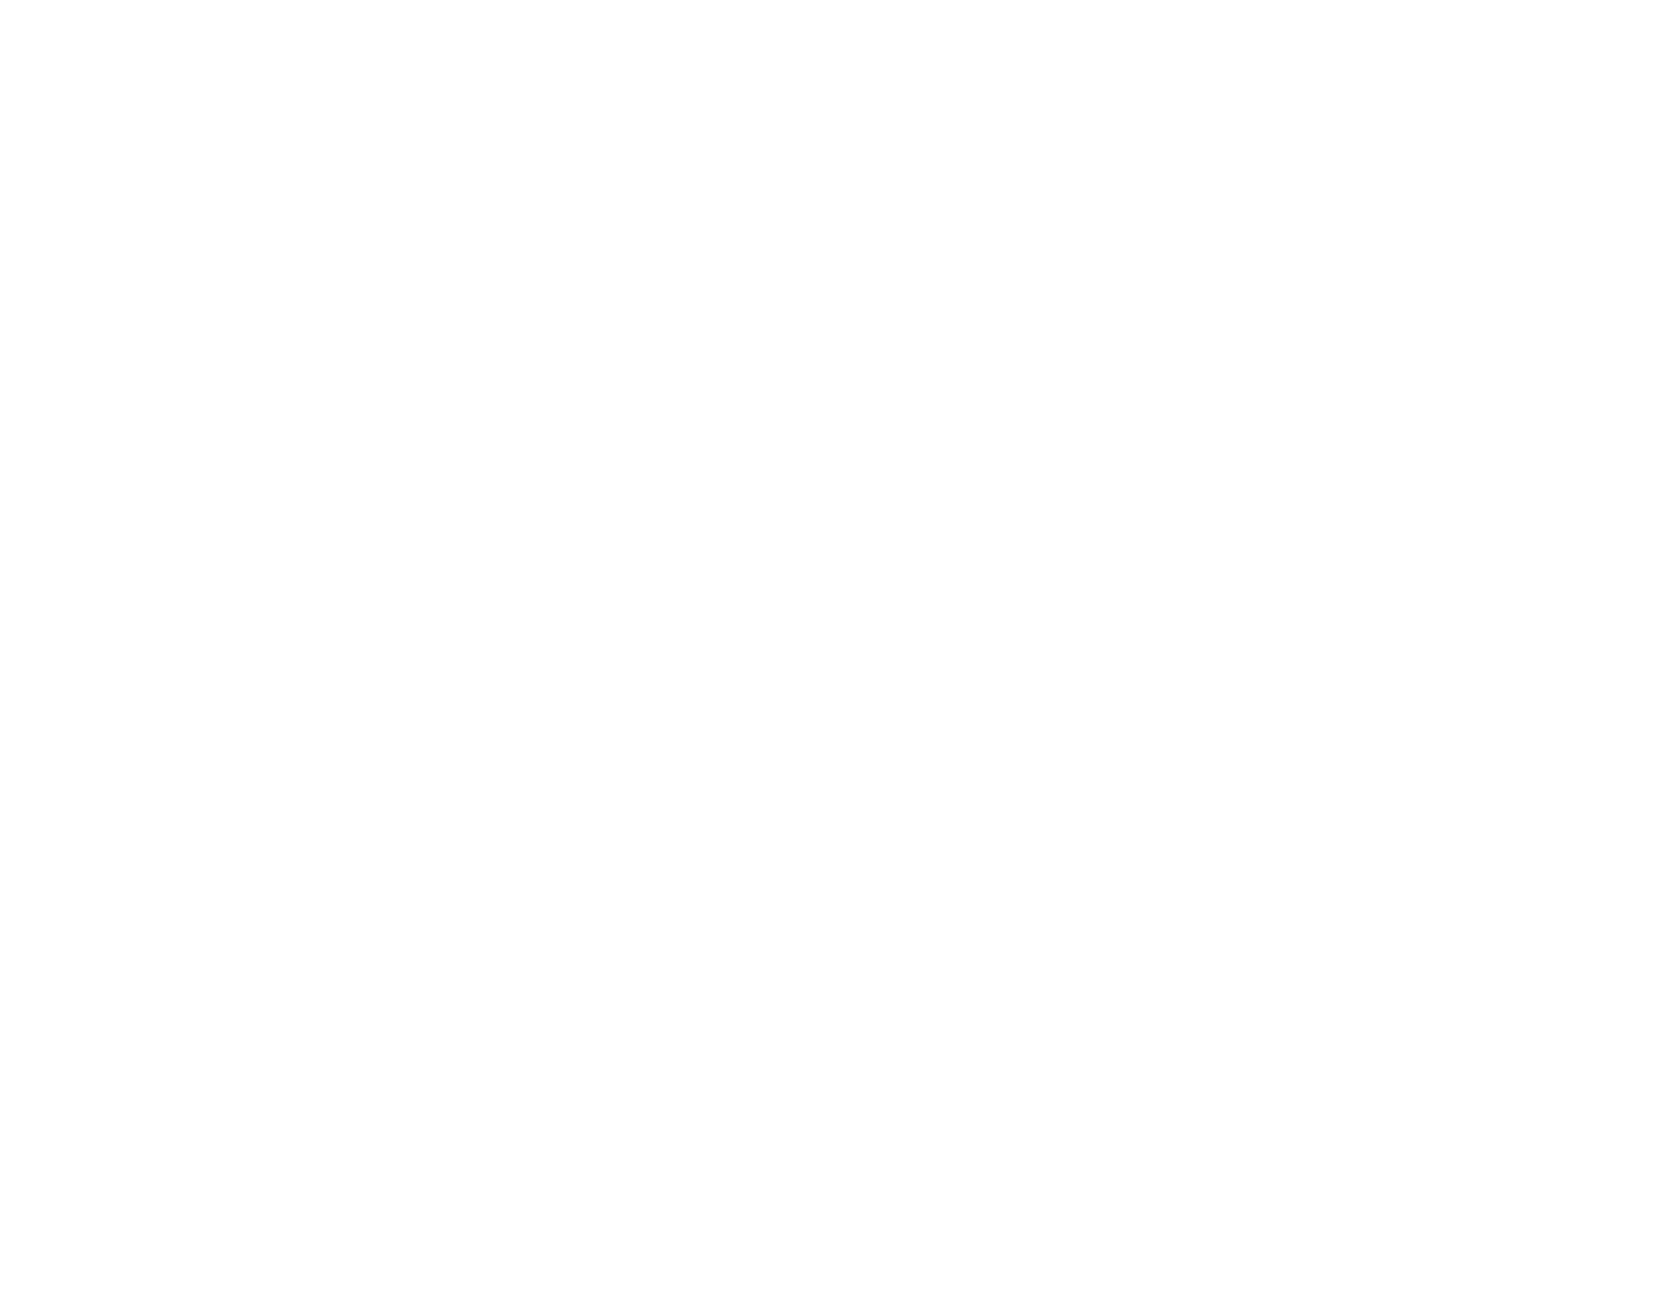 Cotswold 226 Logo